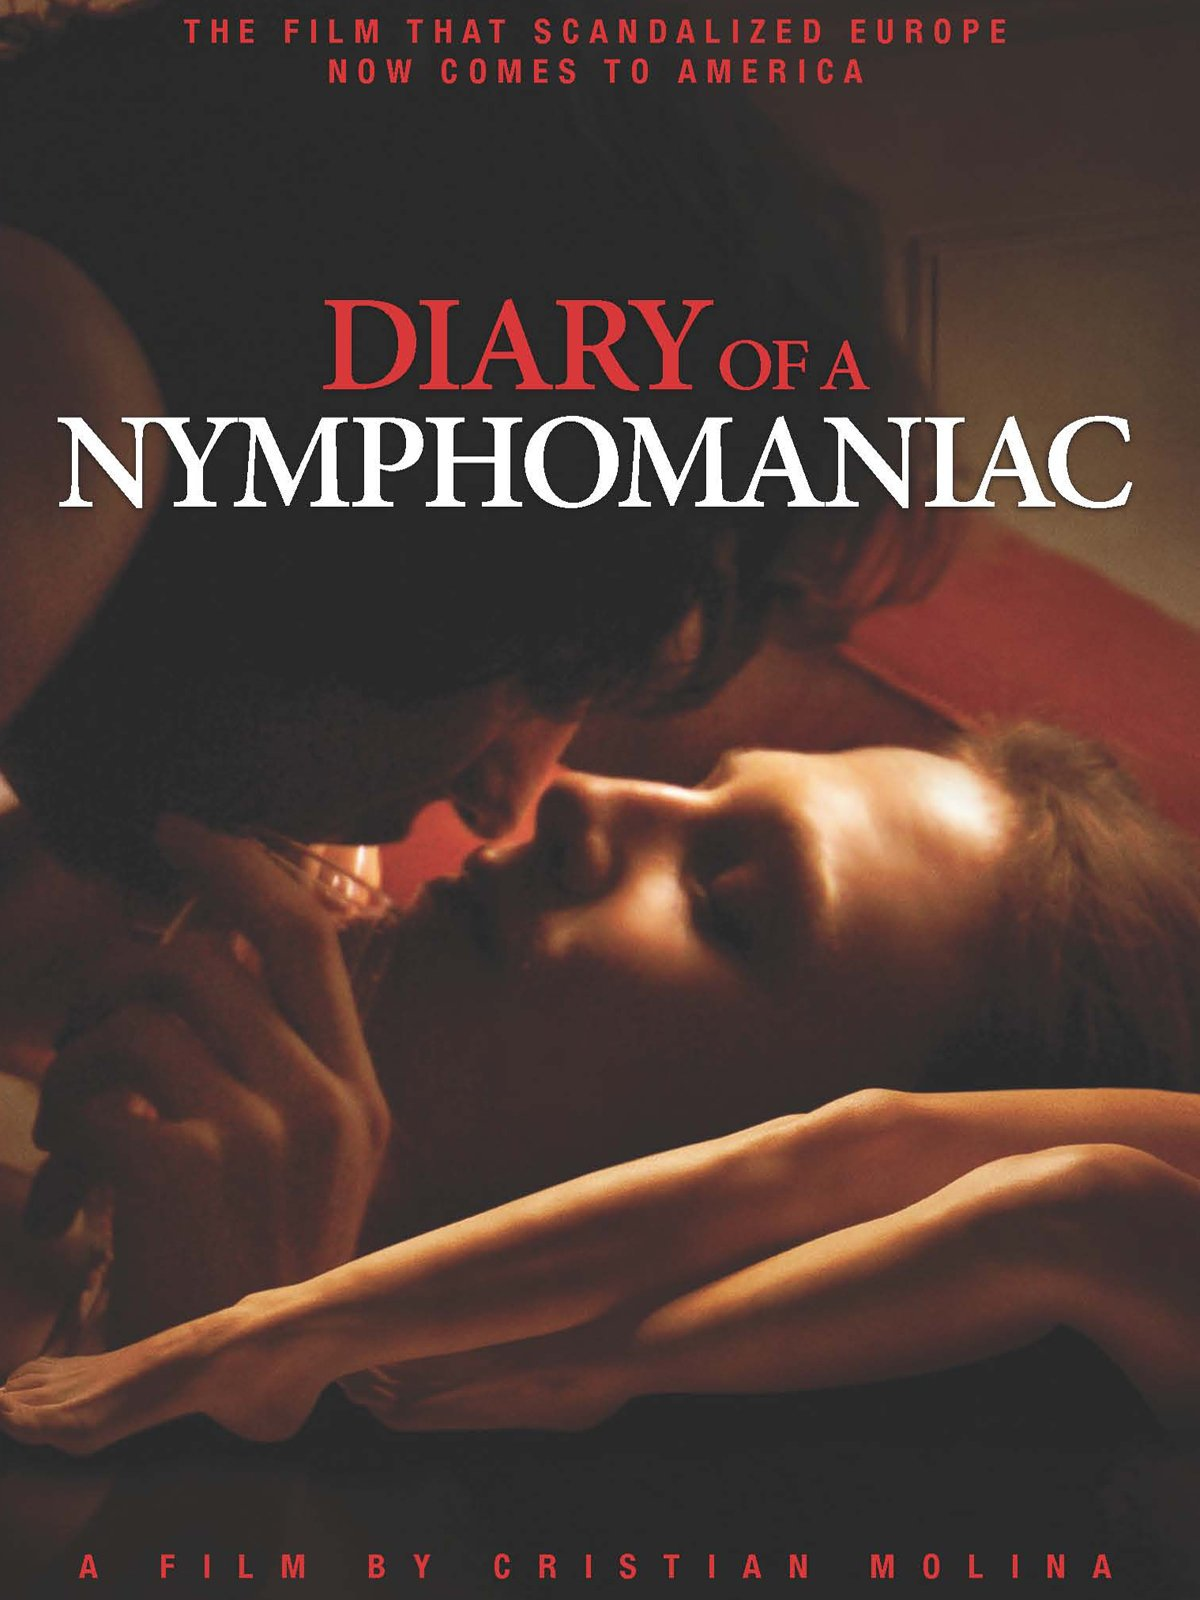 Spanish belen fabra sex scenes in diary of a nymphomaniac